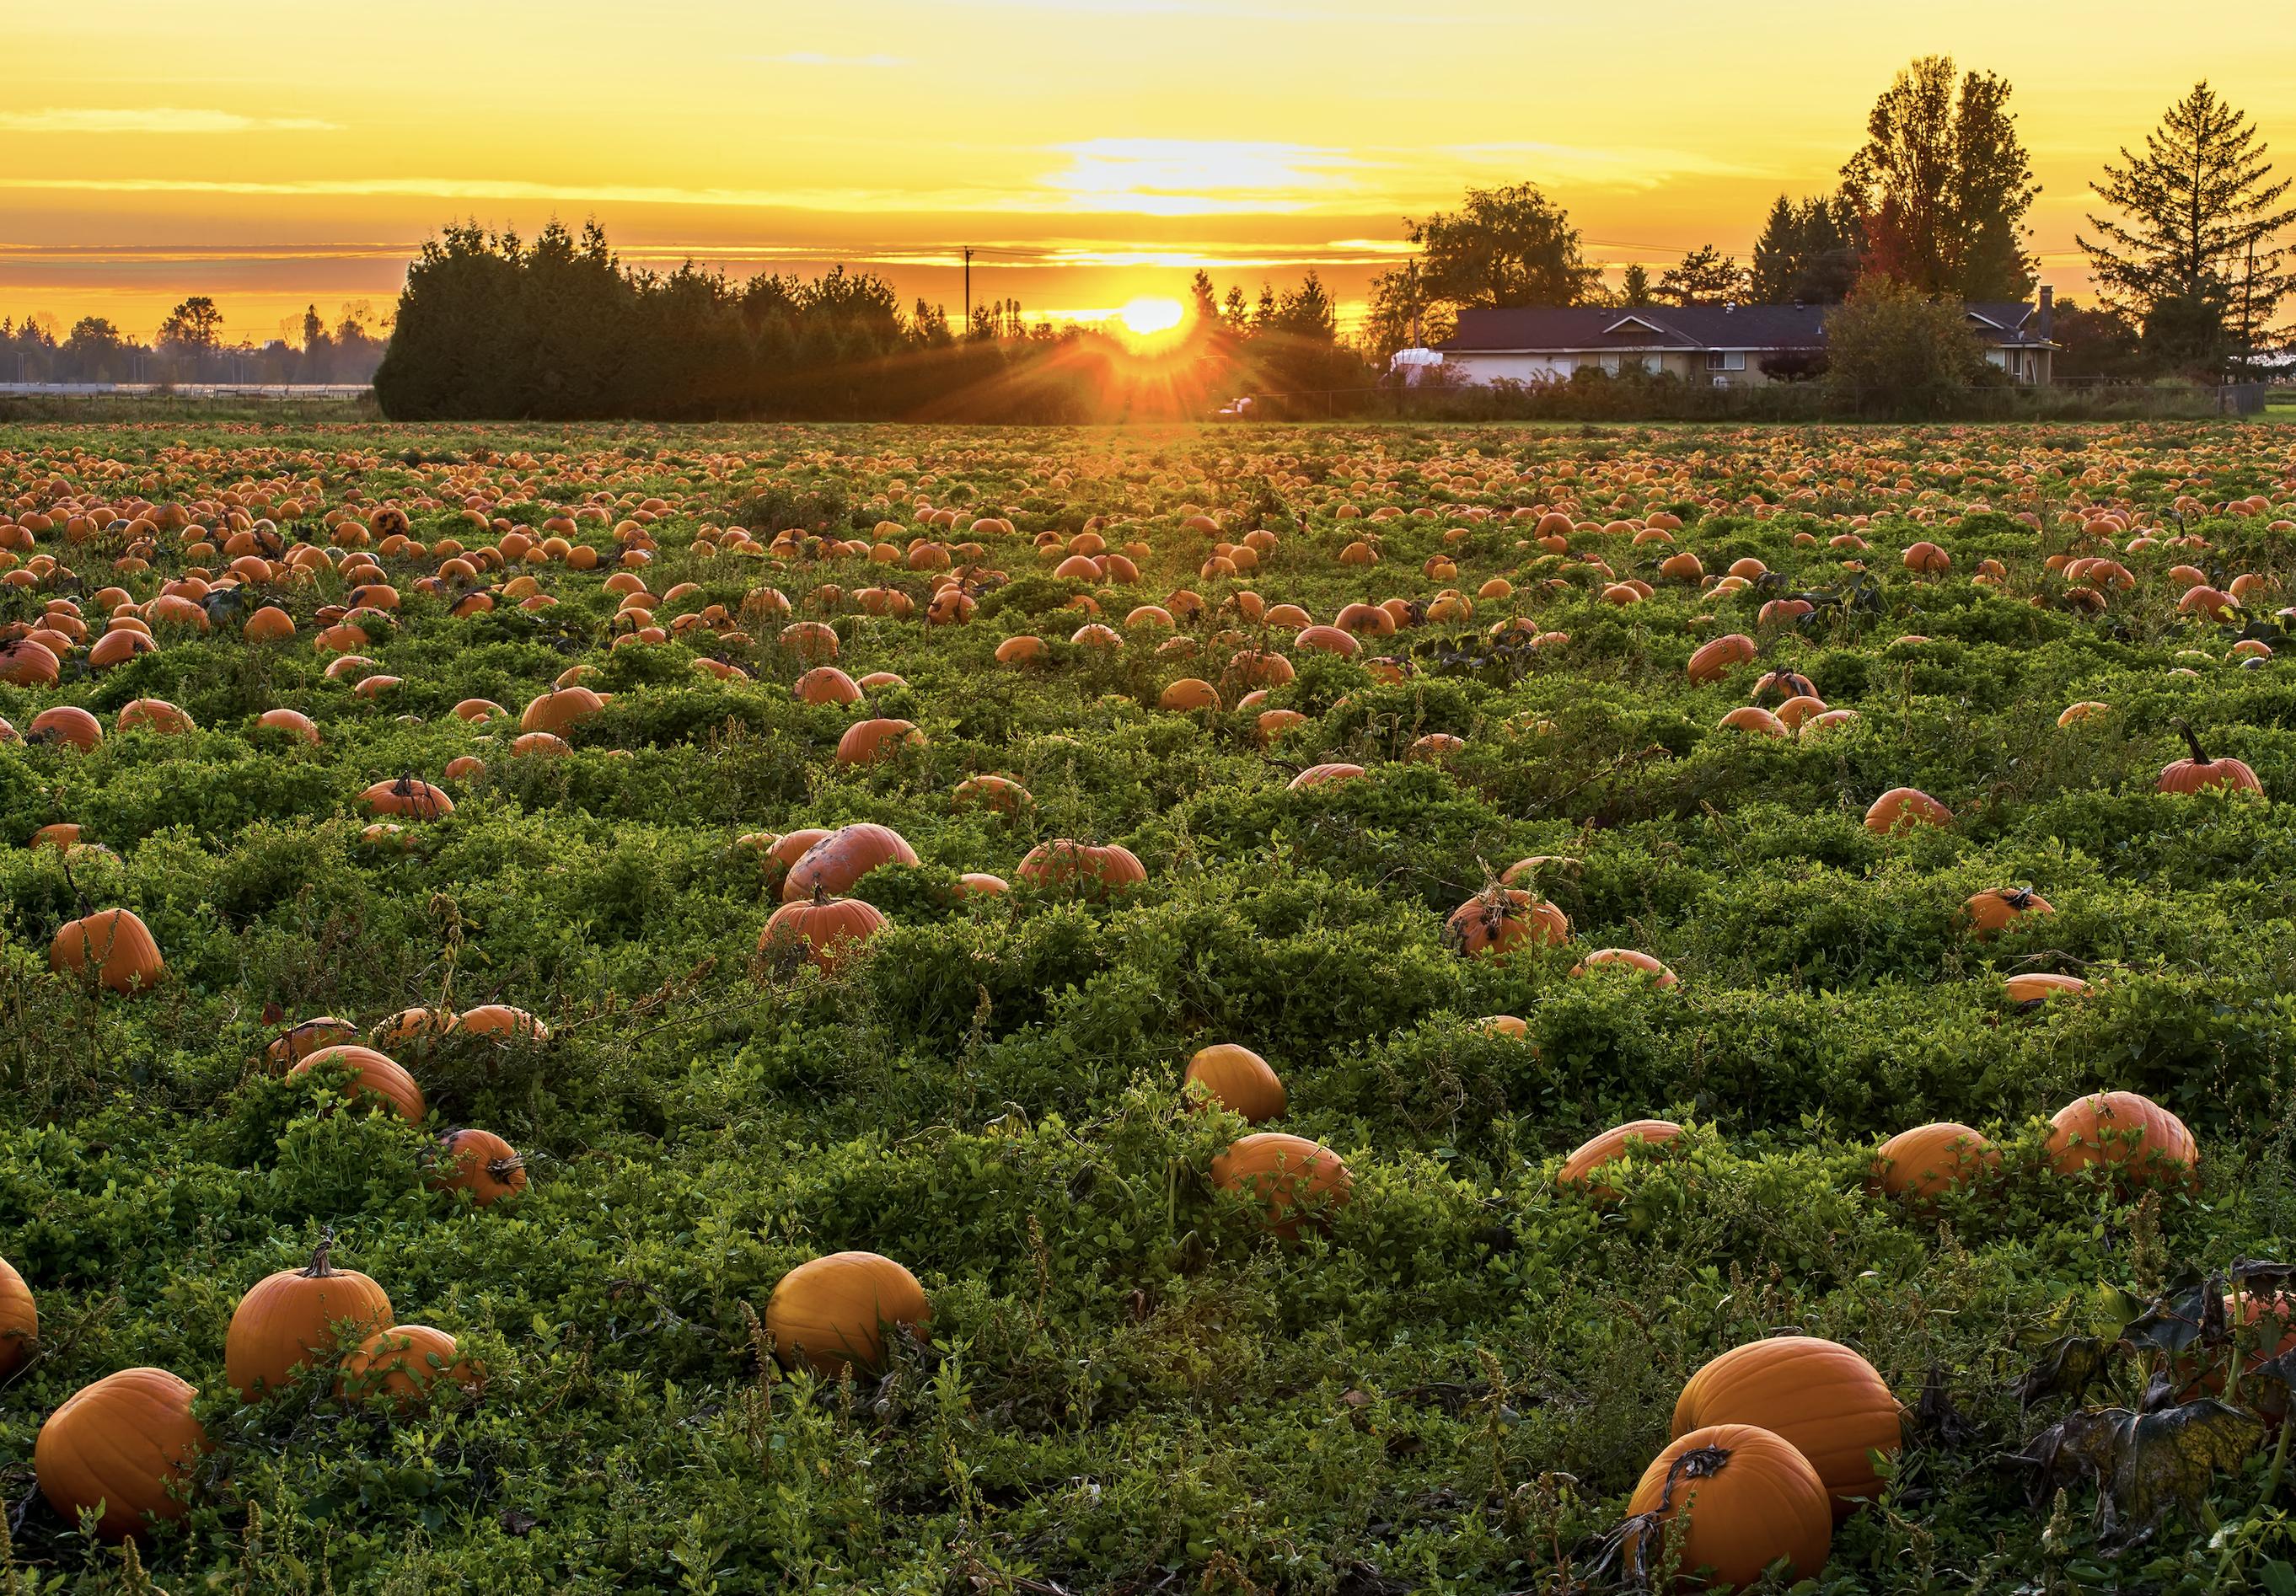 Pumpkin patch and S'mores Caramel Popcorn recipe